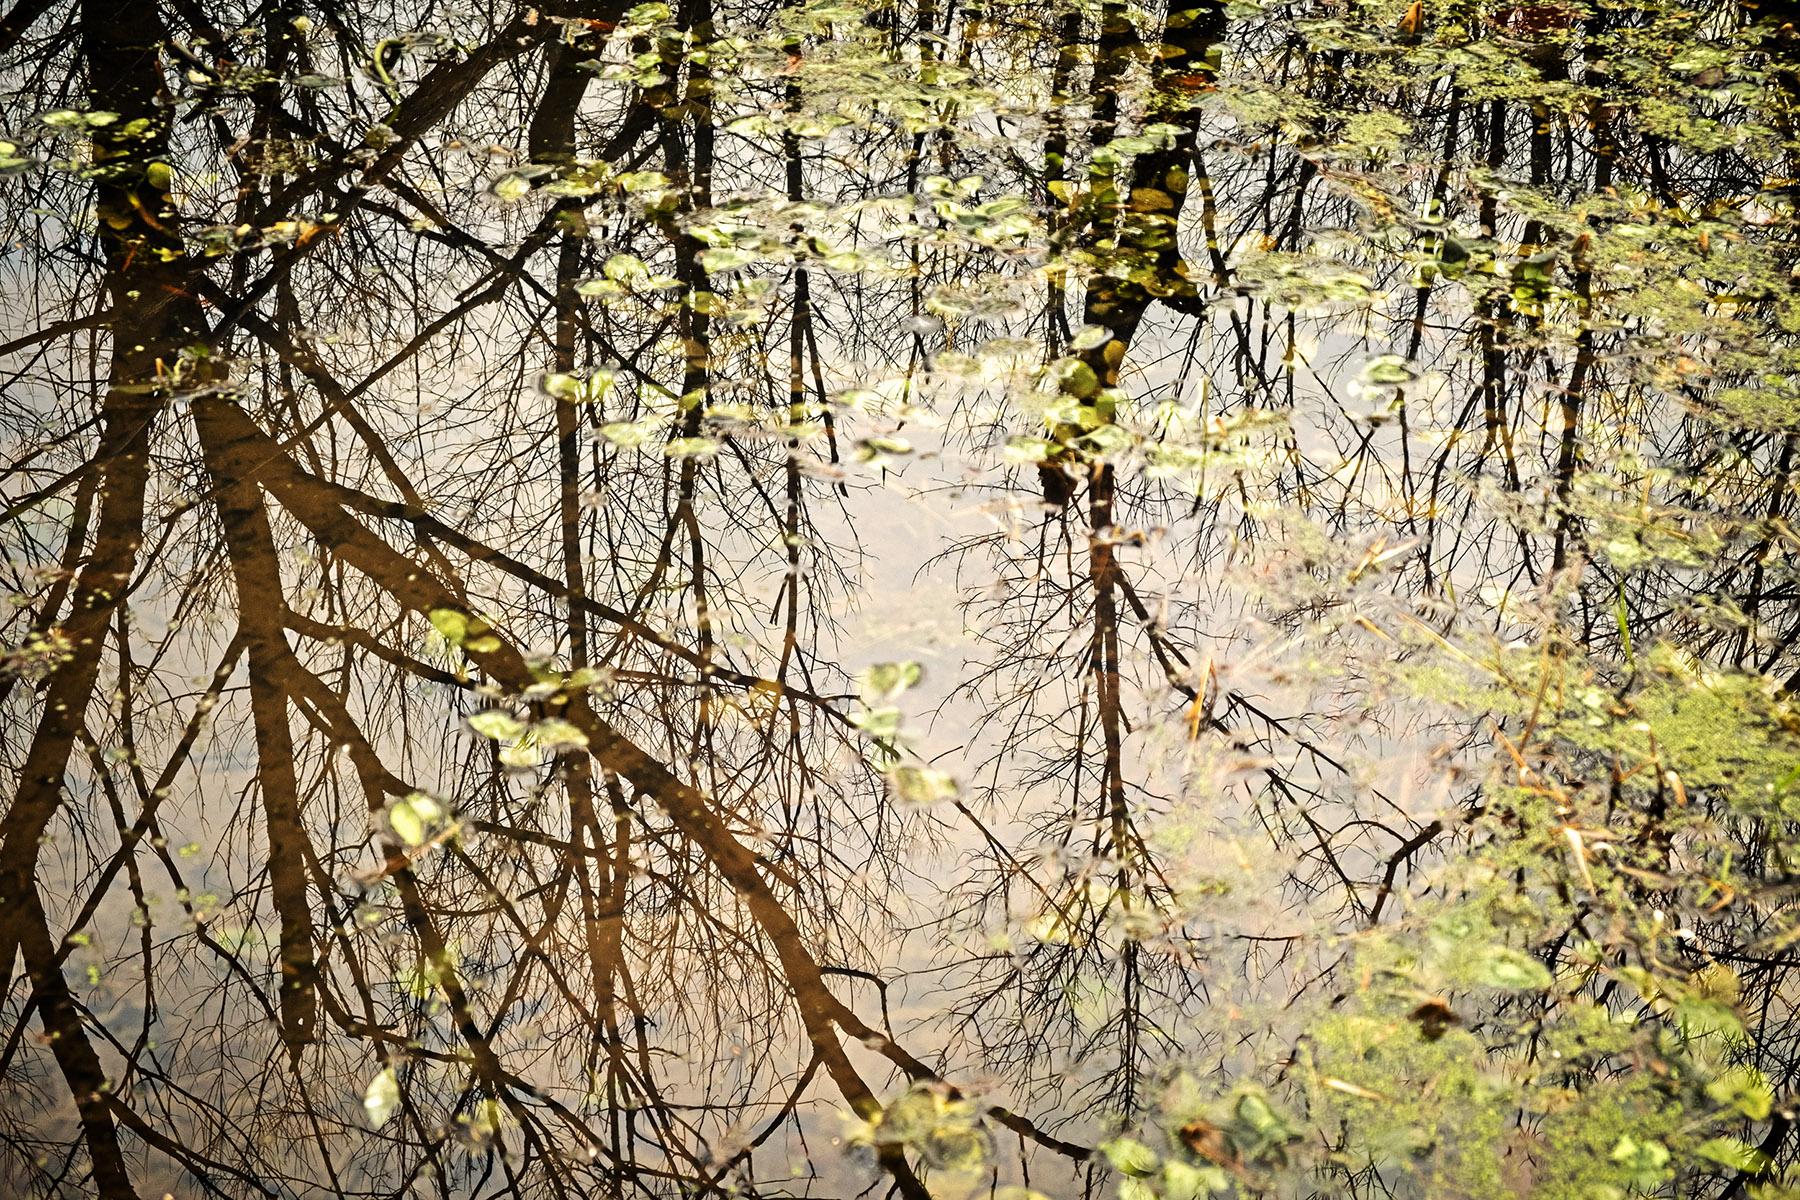 ws_naturecenter_reflection_suzanslgottshallDSCF0458.jpg